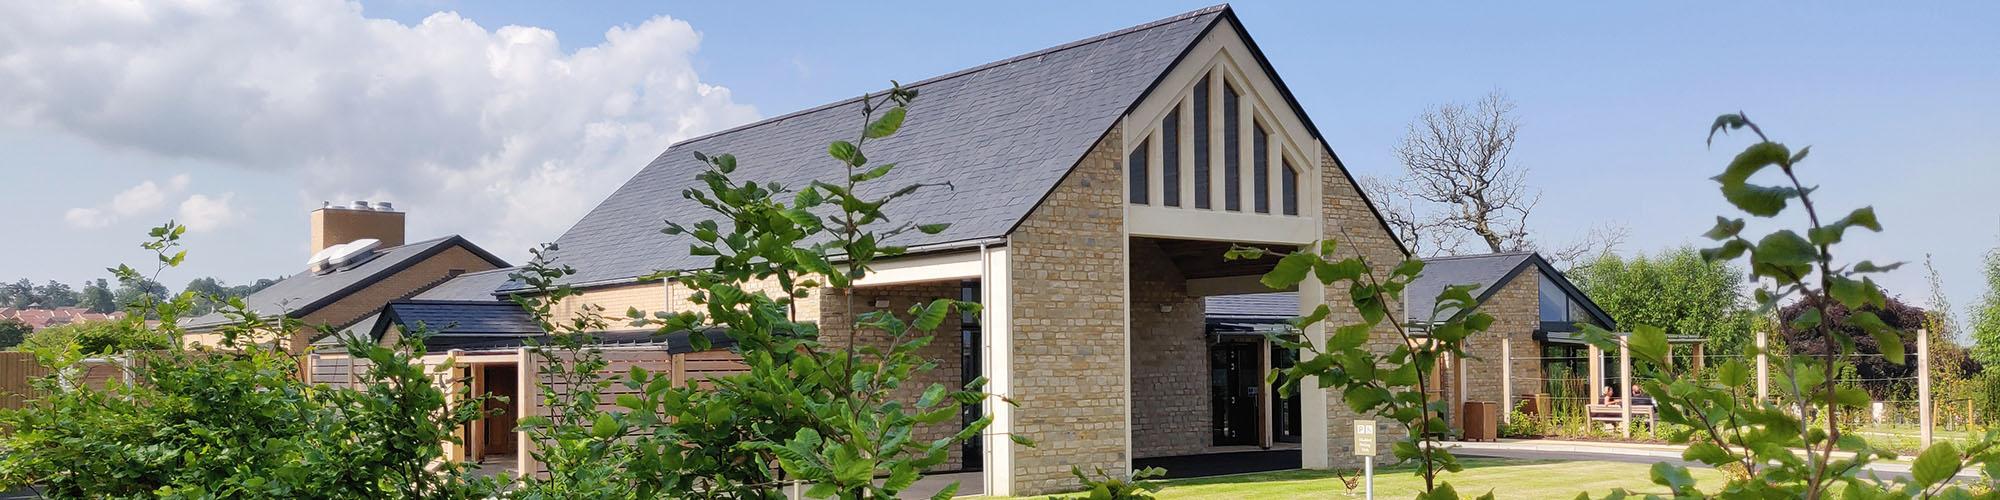 willow chapel 1 2000x500